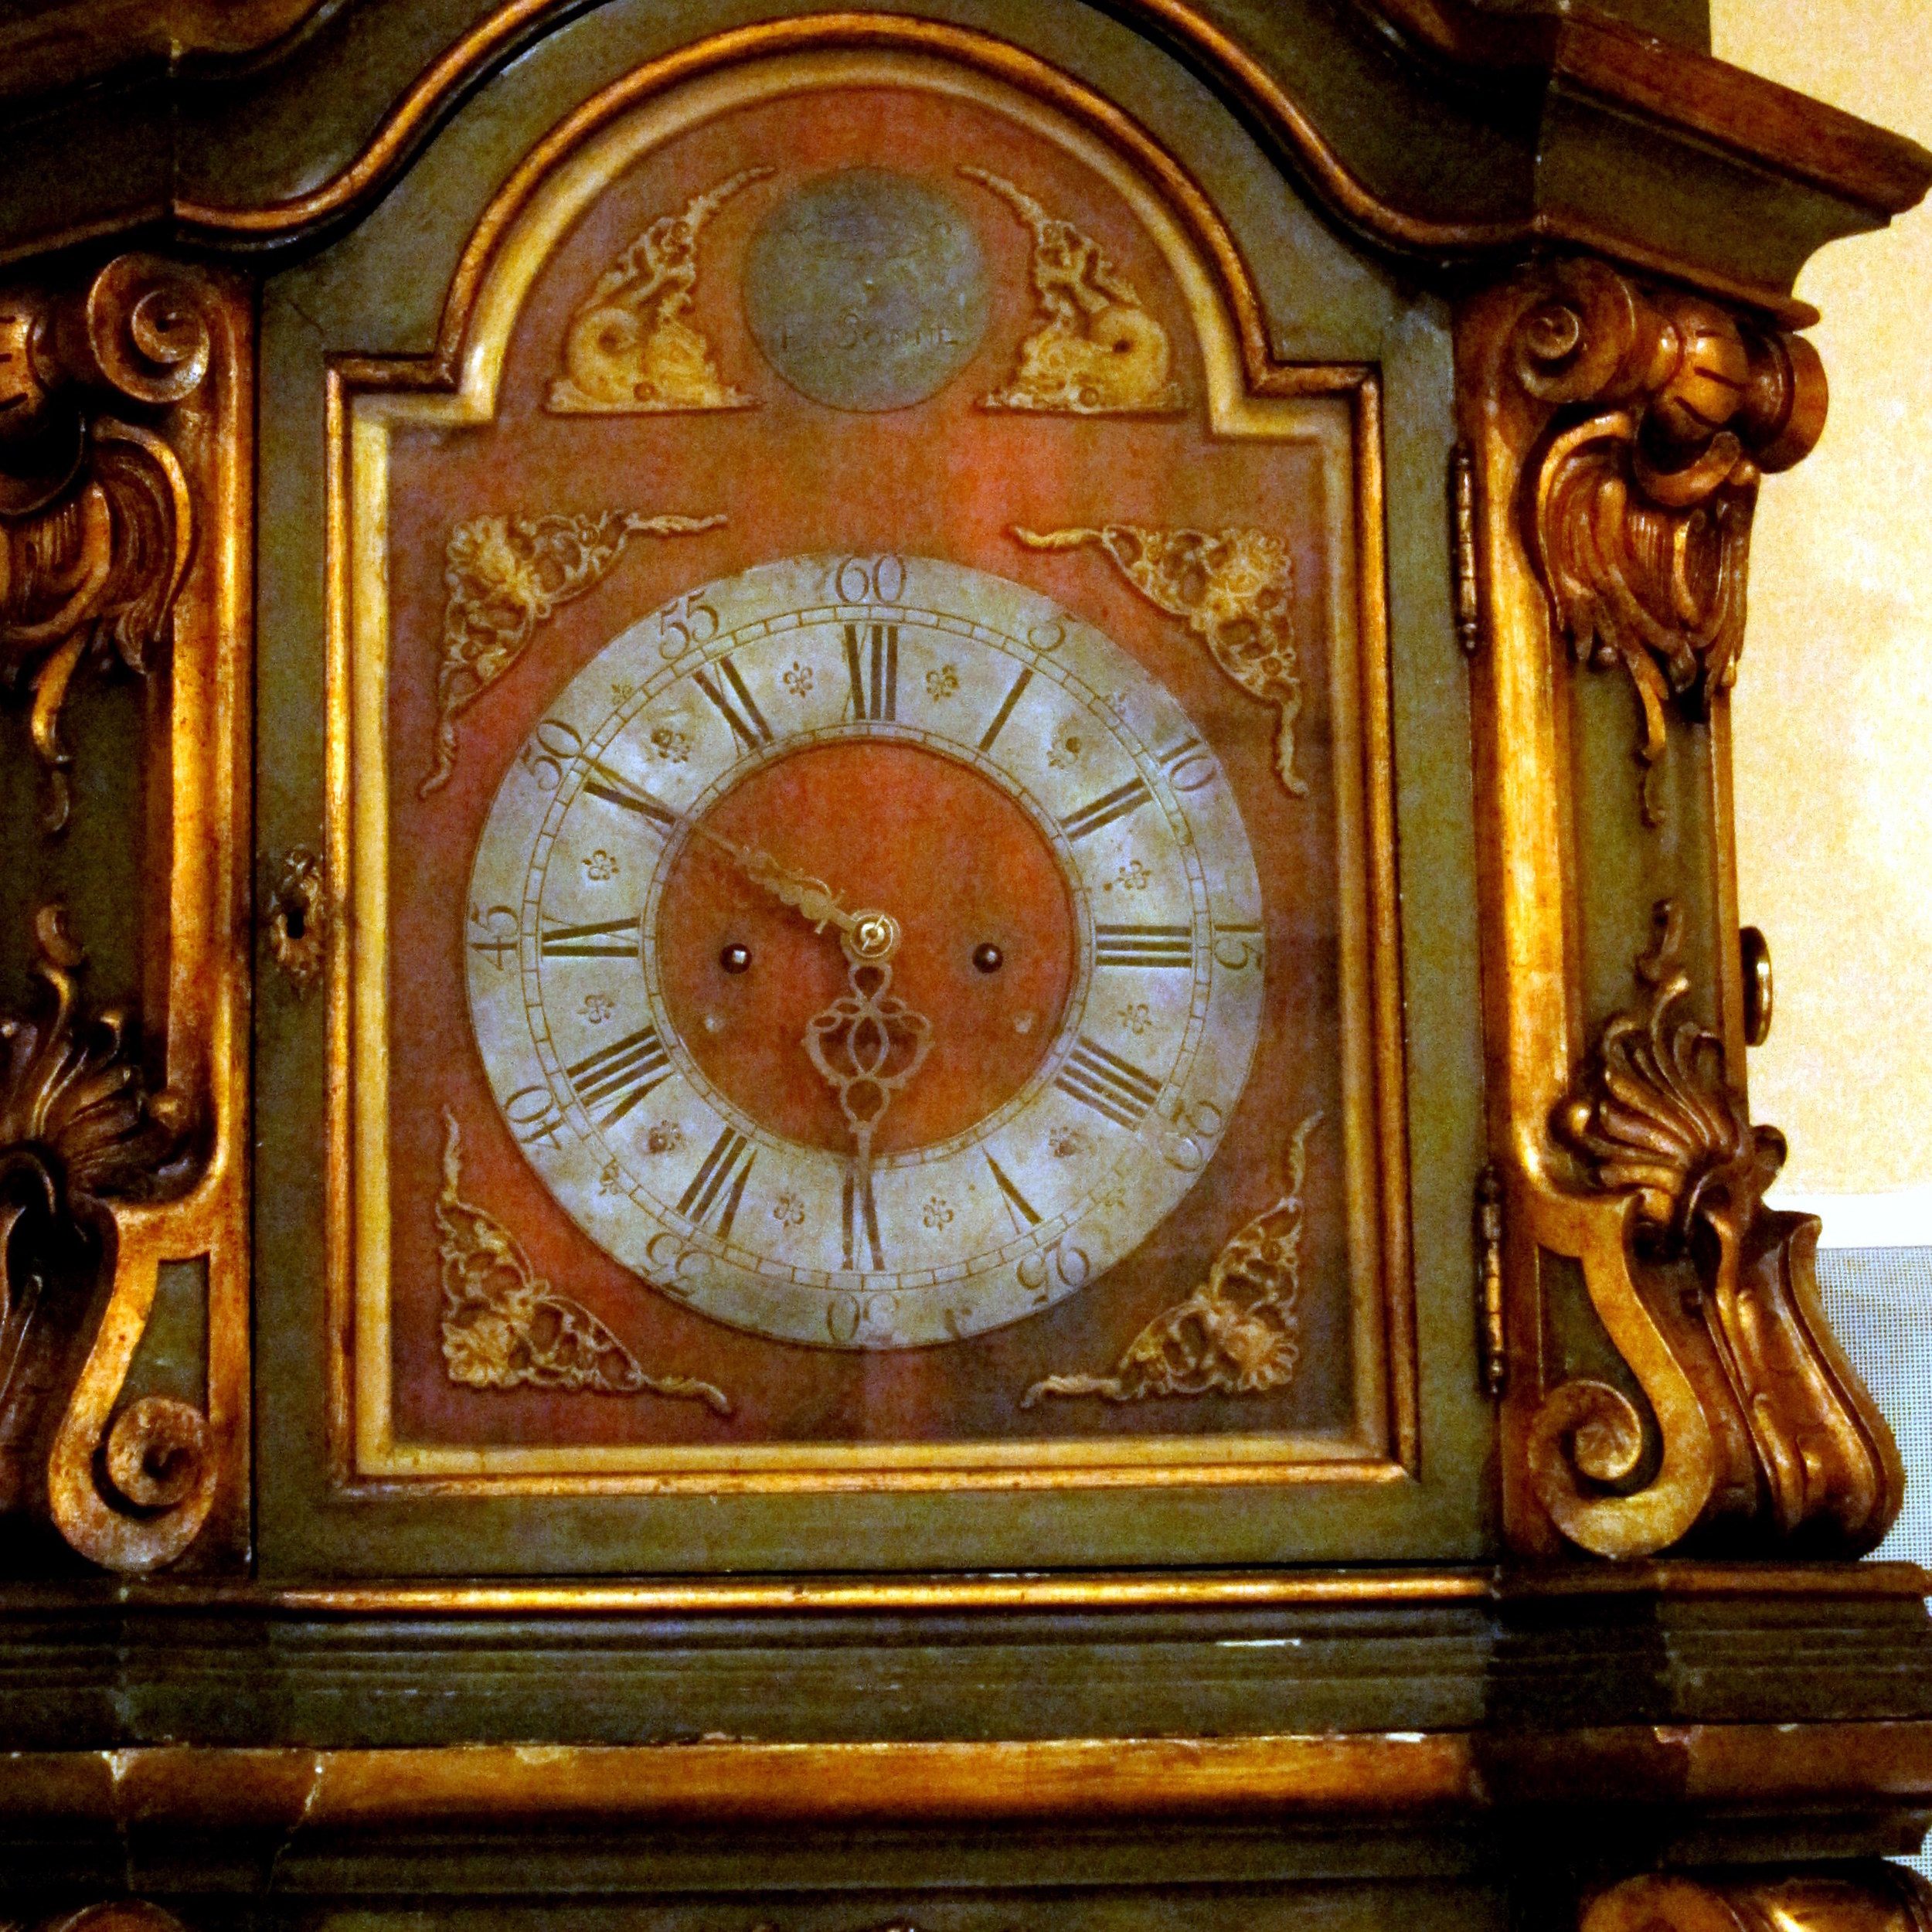 Polyphon Tallcase Musical Clock